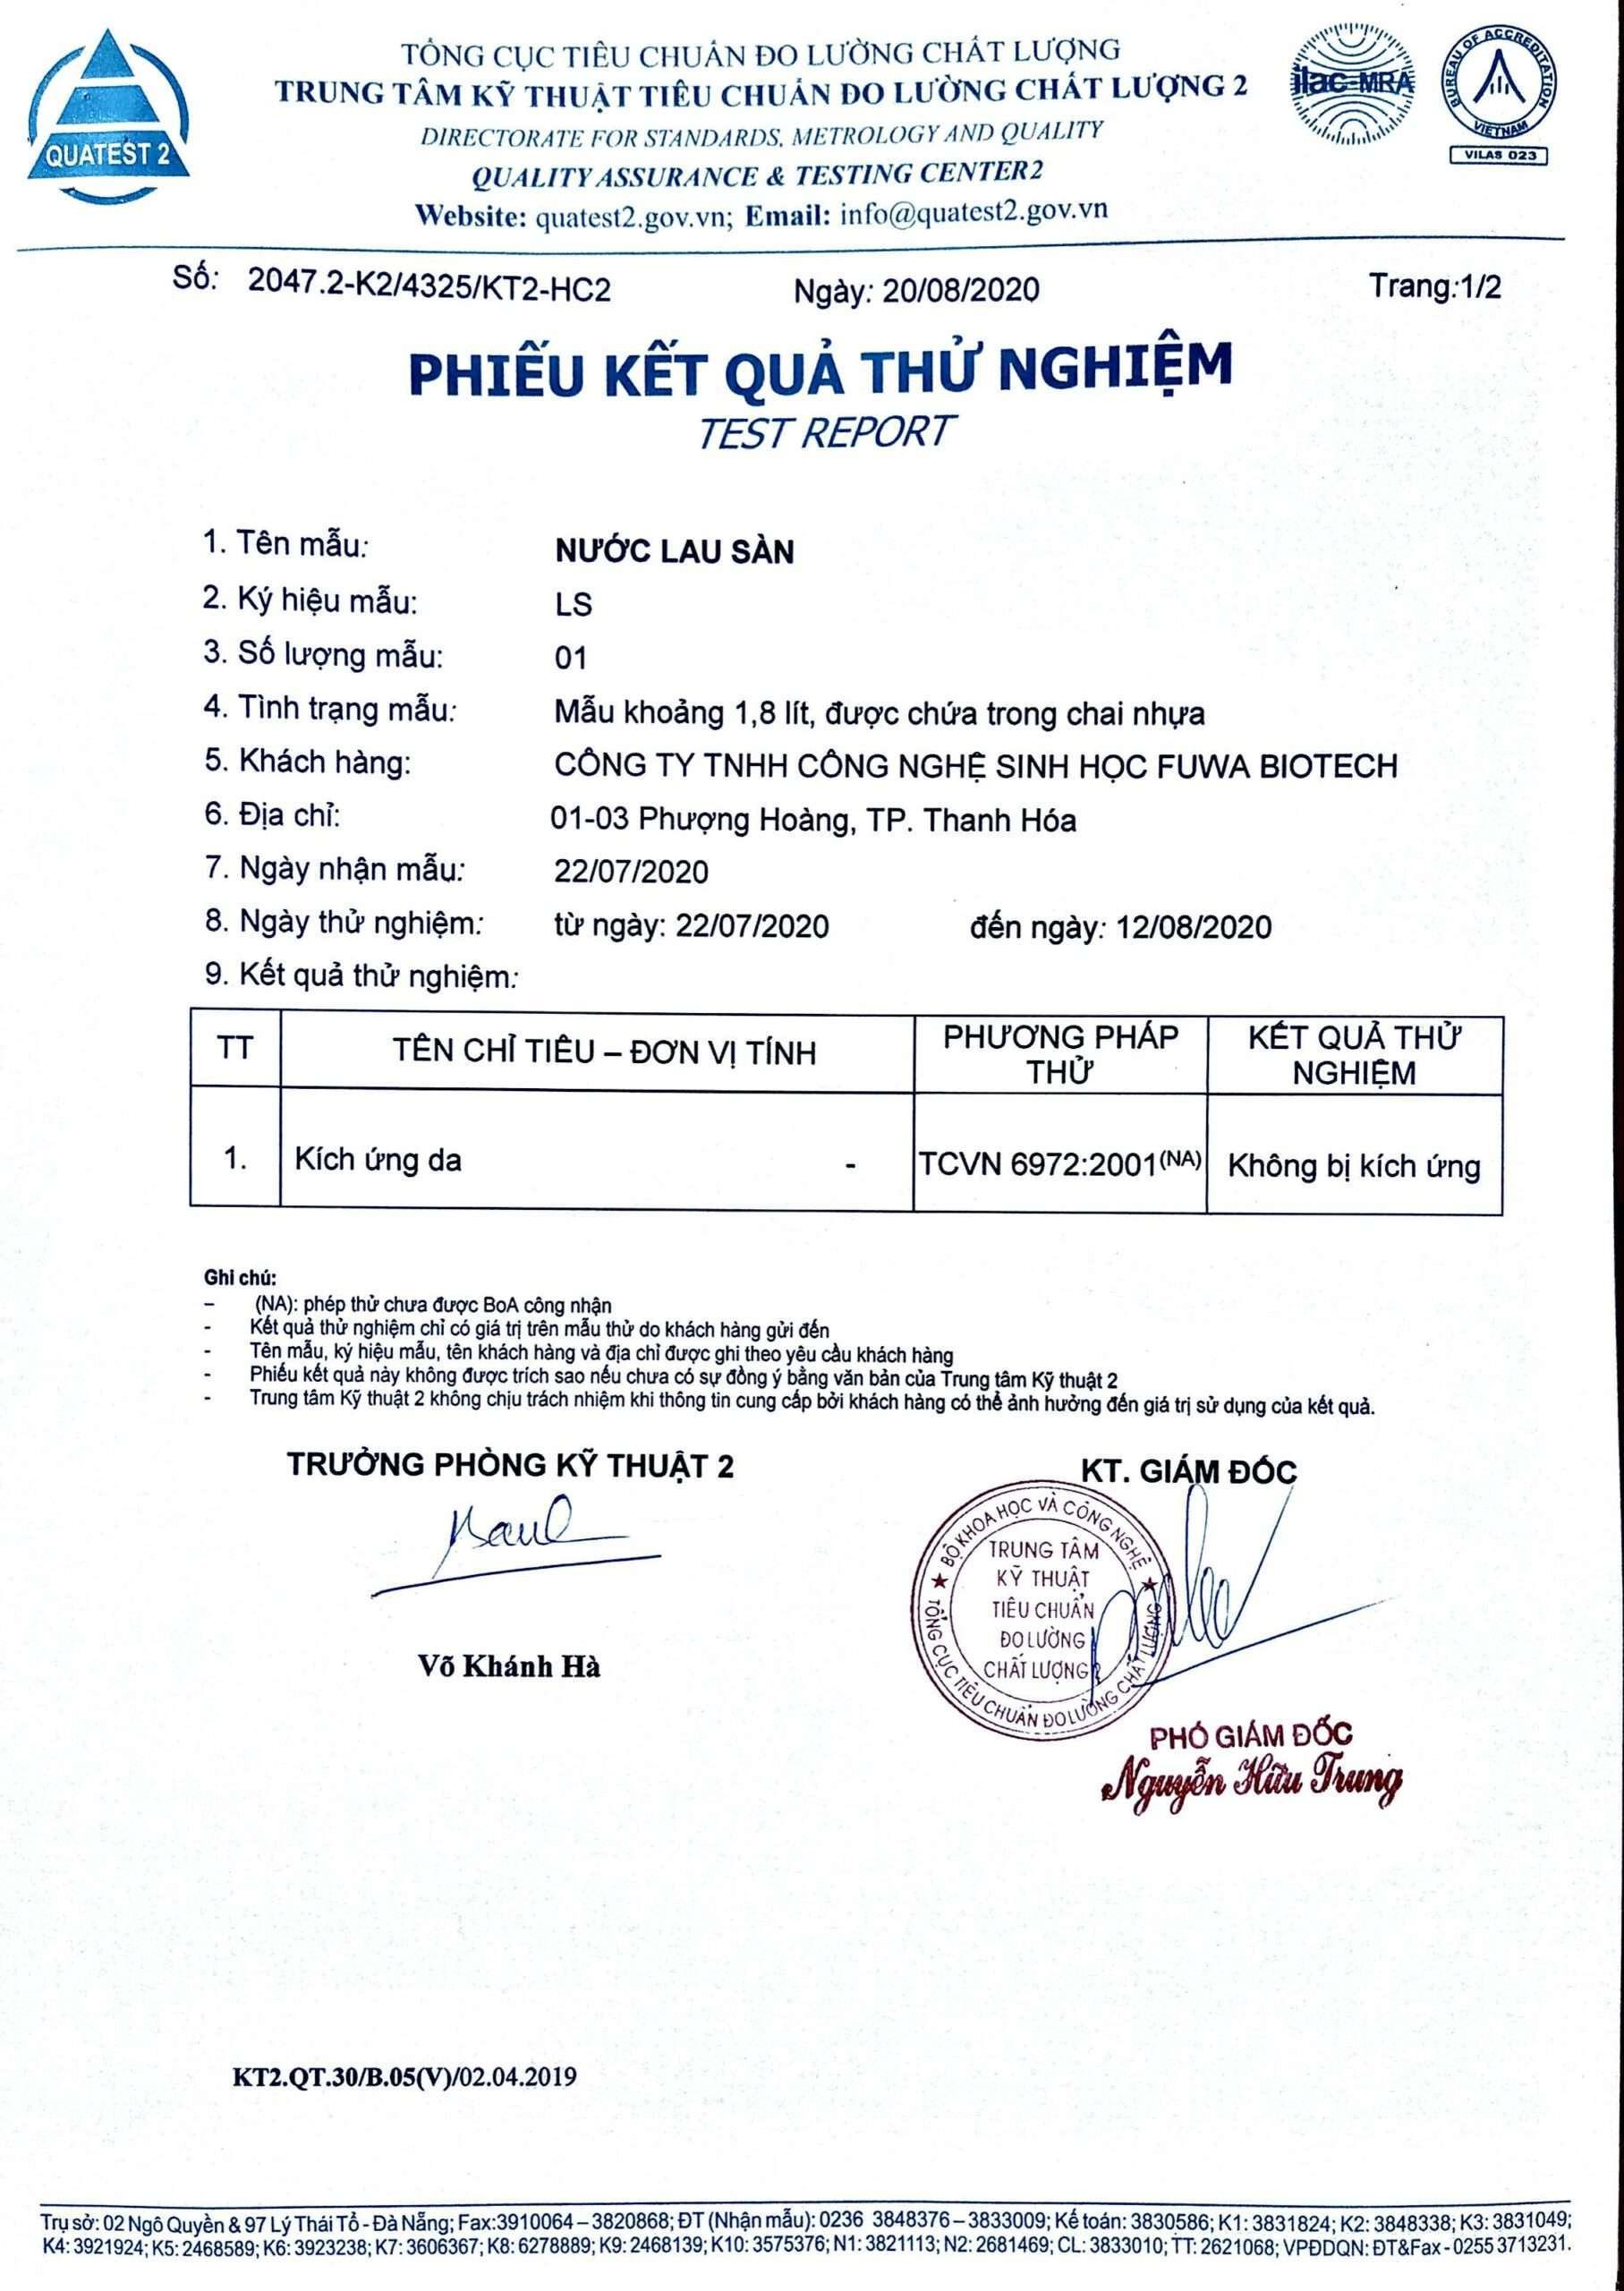 03 Test Nuoc LAU SAN Kich Ung da scaled